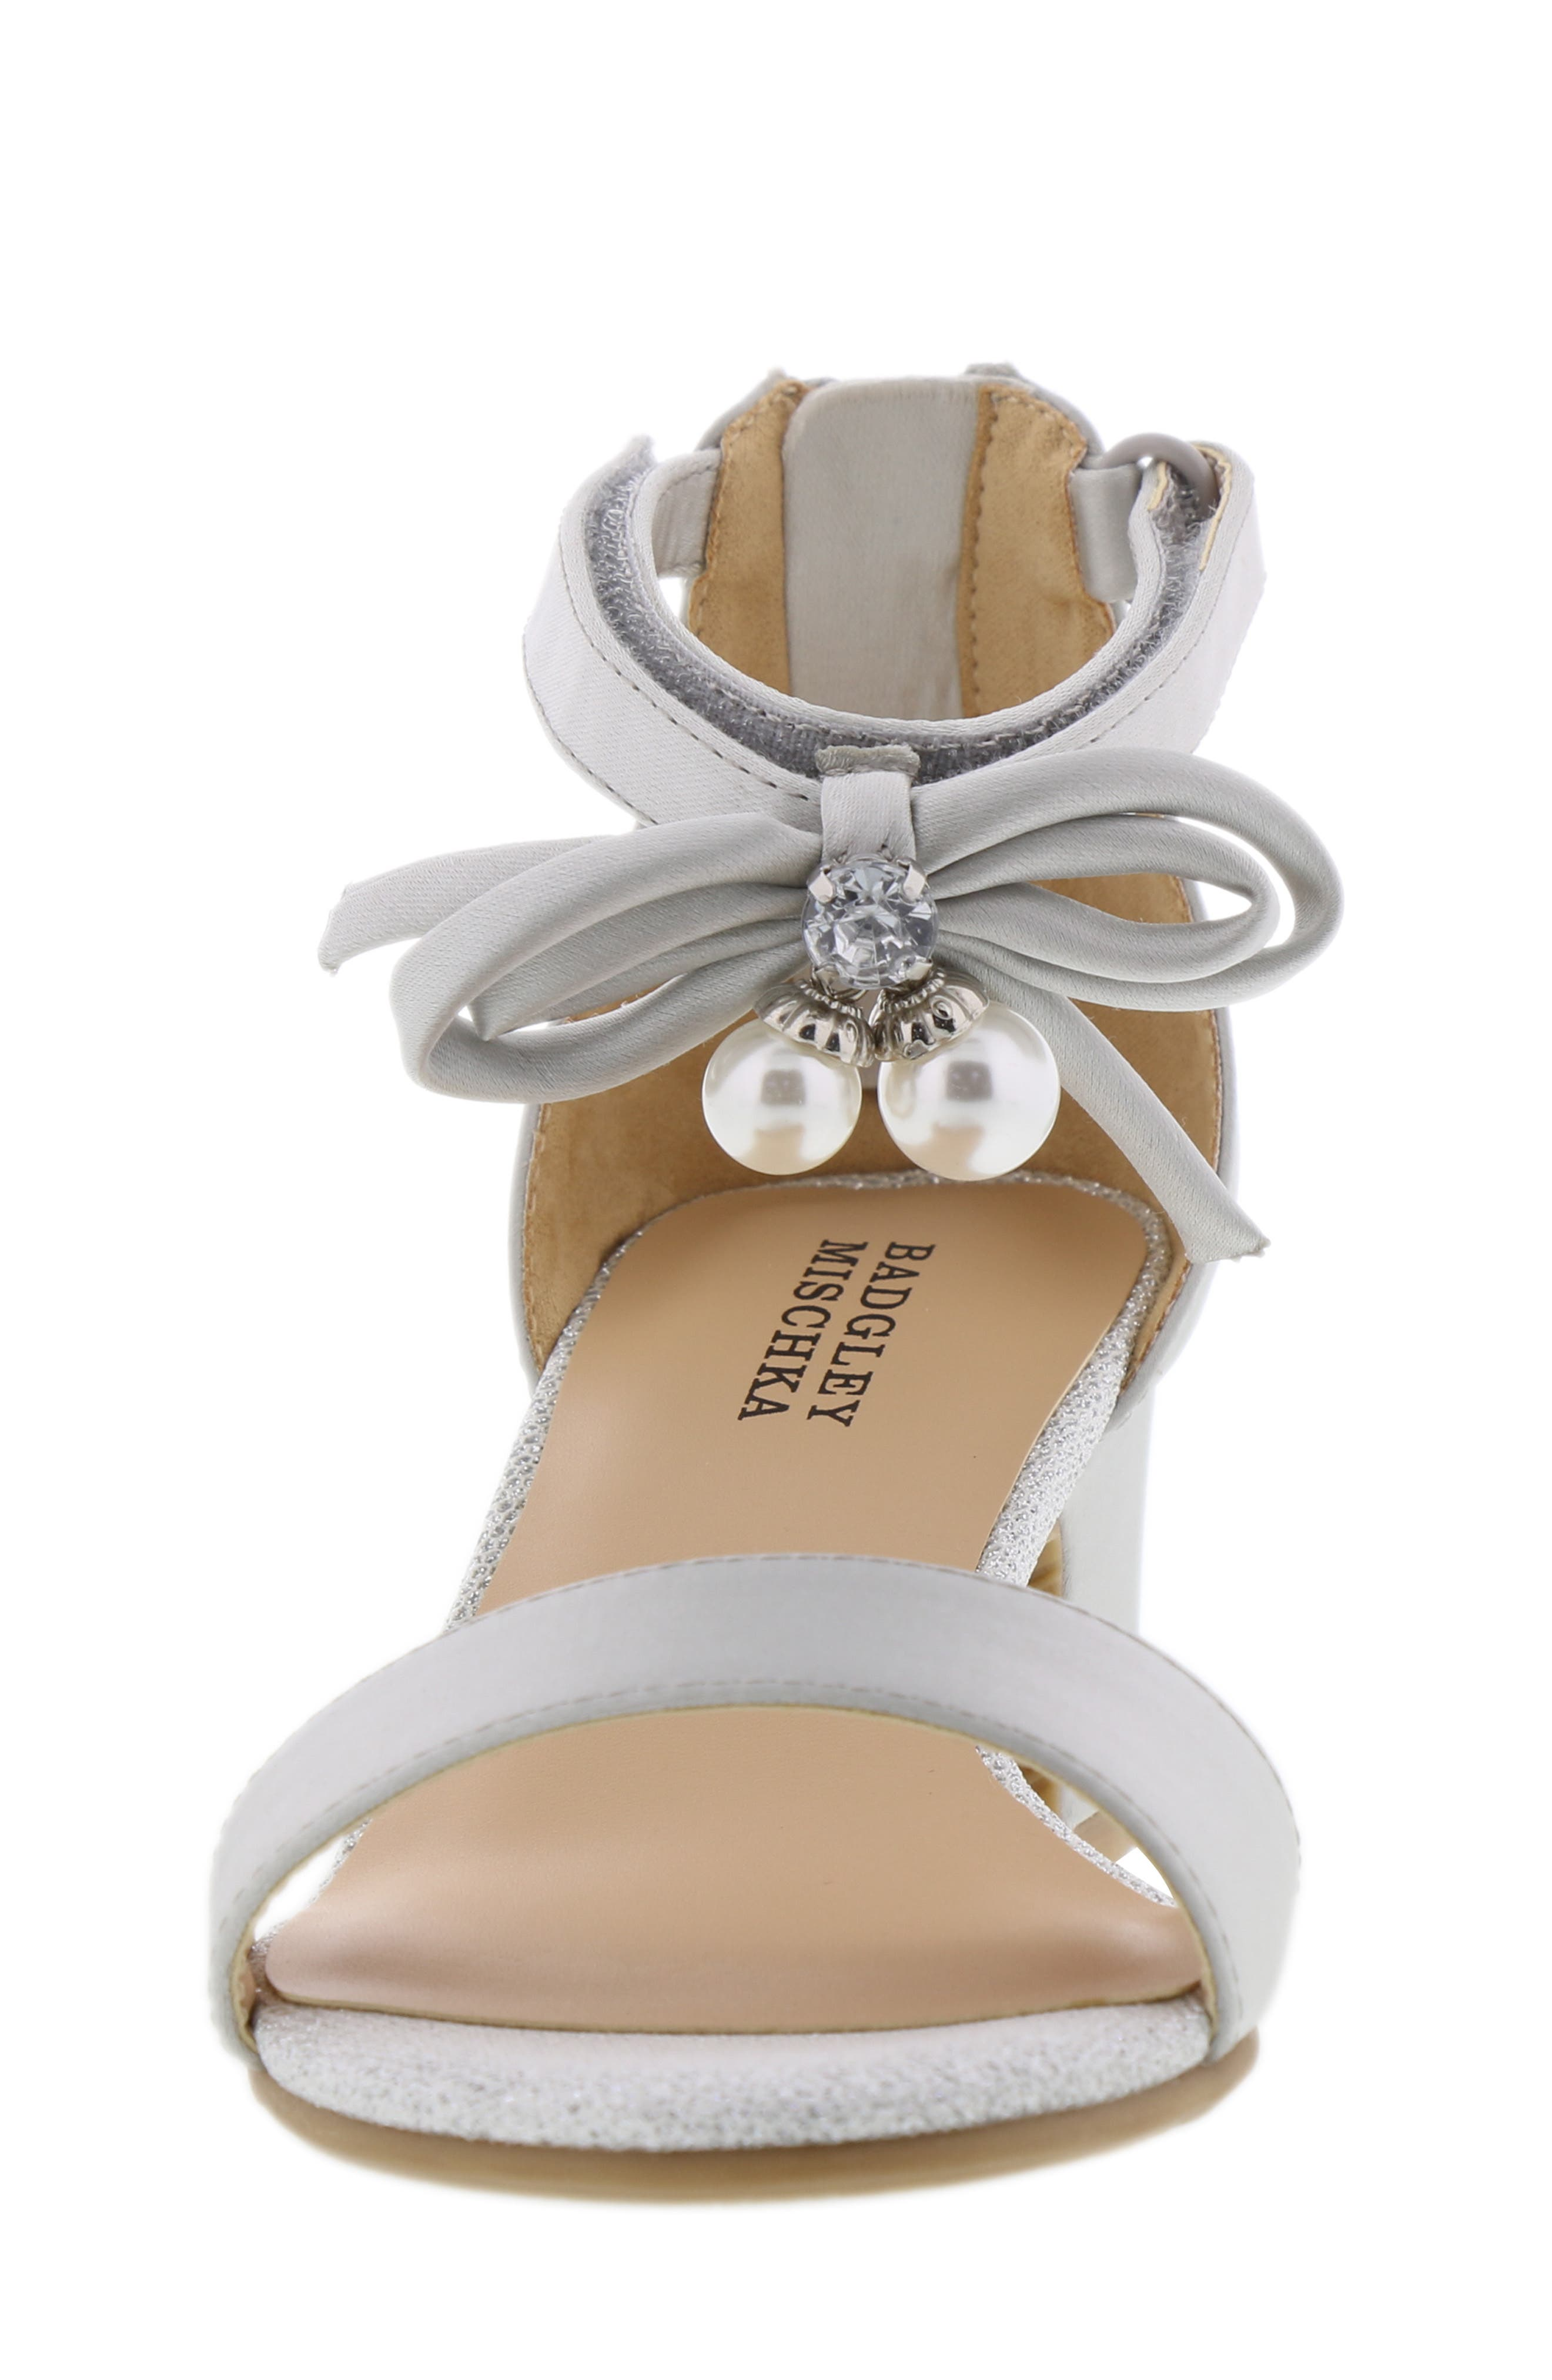 BADGLEY MISCHKA COLLECTION, Badgley Mischka Pernia Embellished Bow Sandal, Alternate thumbnail 4, color, SILVER